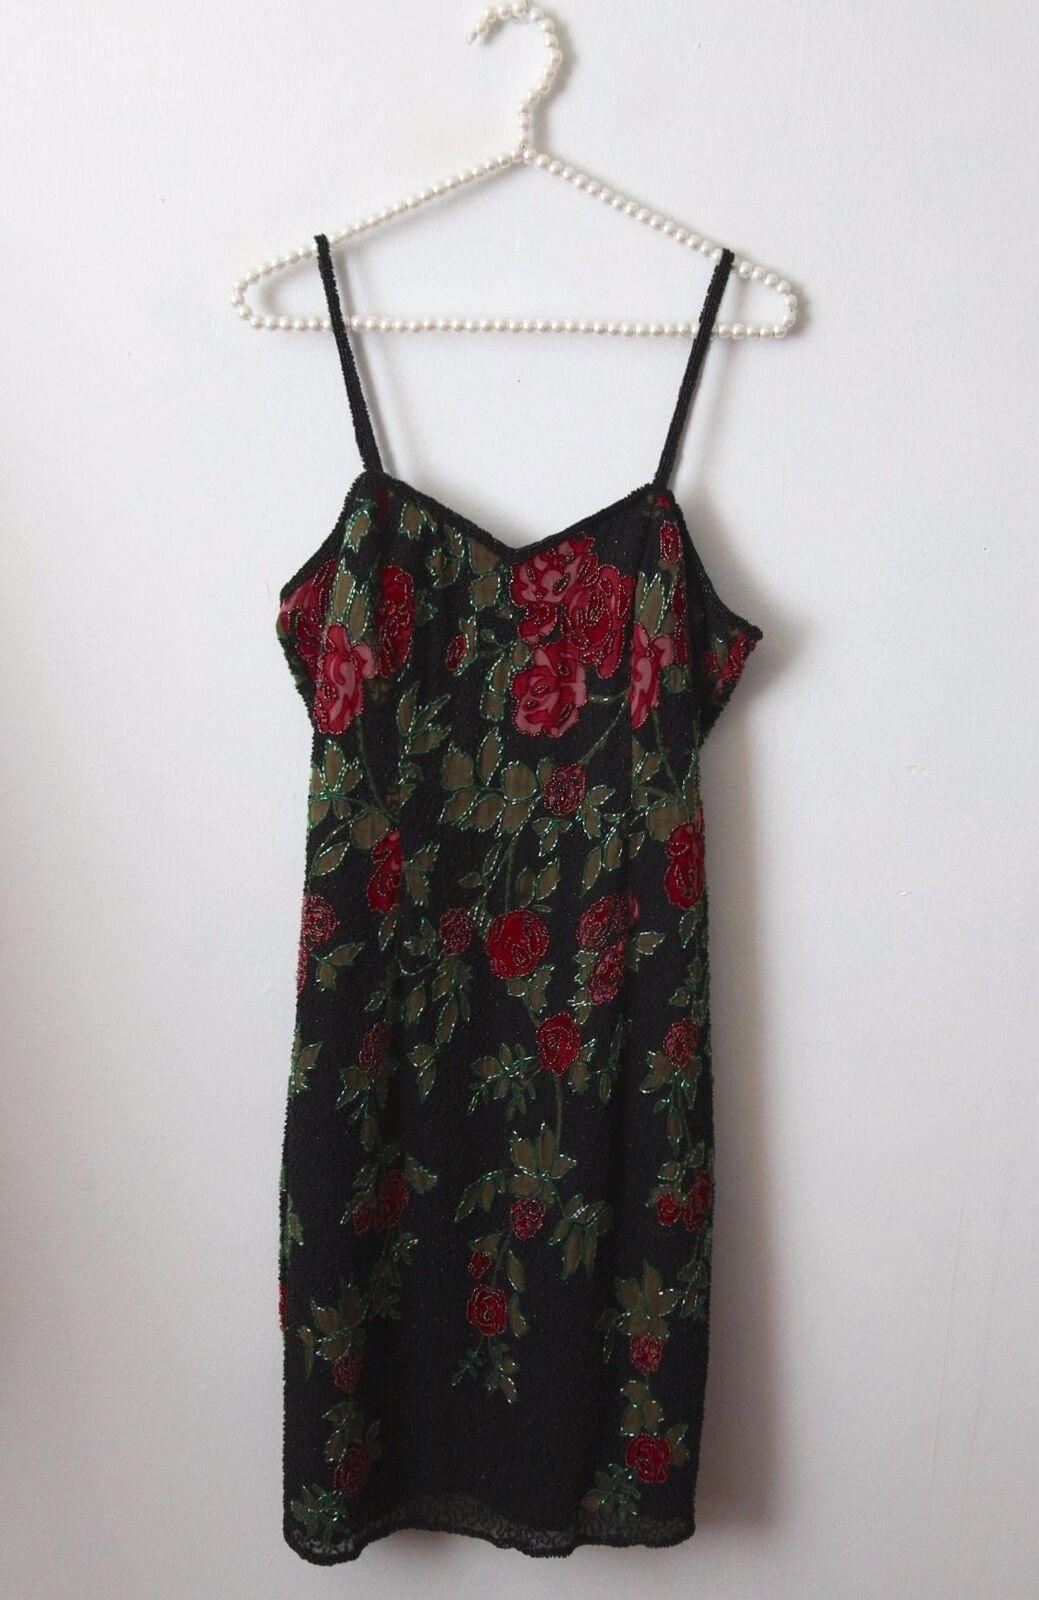 5949ff3d974c64 Vtg schwarz Grün rot Floral Silk Beaded Sequin Evening Party Dress M  Cocktail